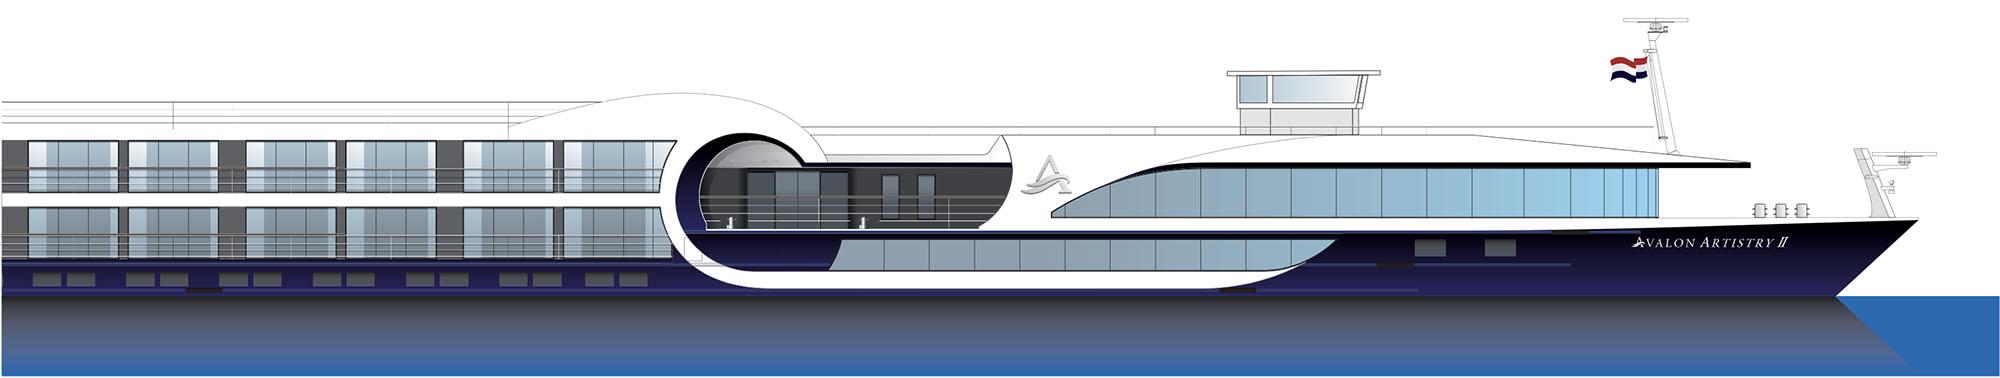 Studio-L design of a river cruiseship